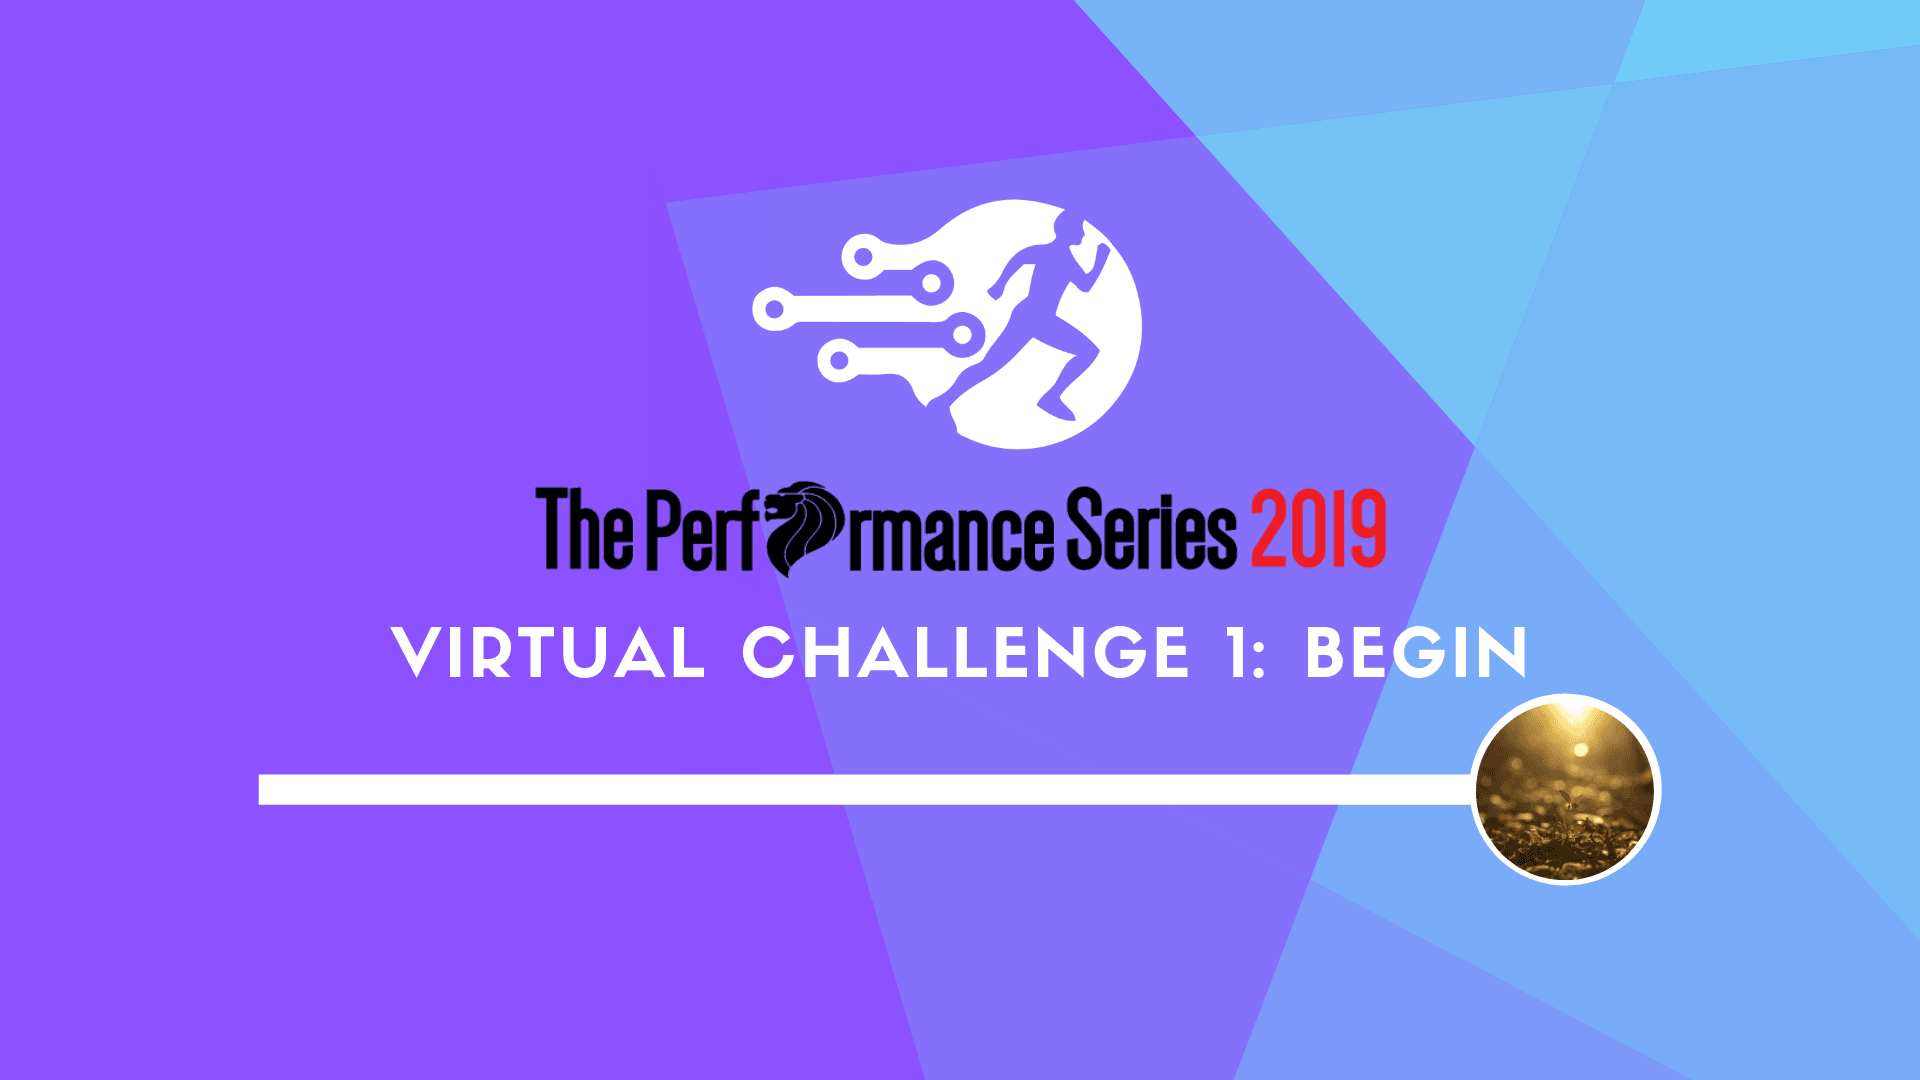 Logo of The Performance Series 2019 Virtual Challenge 1: Begin